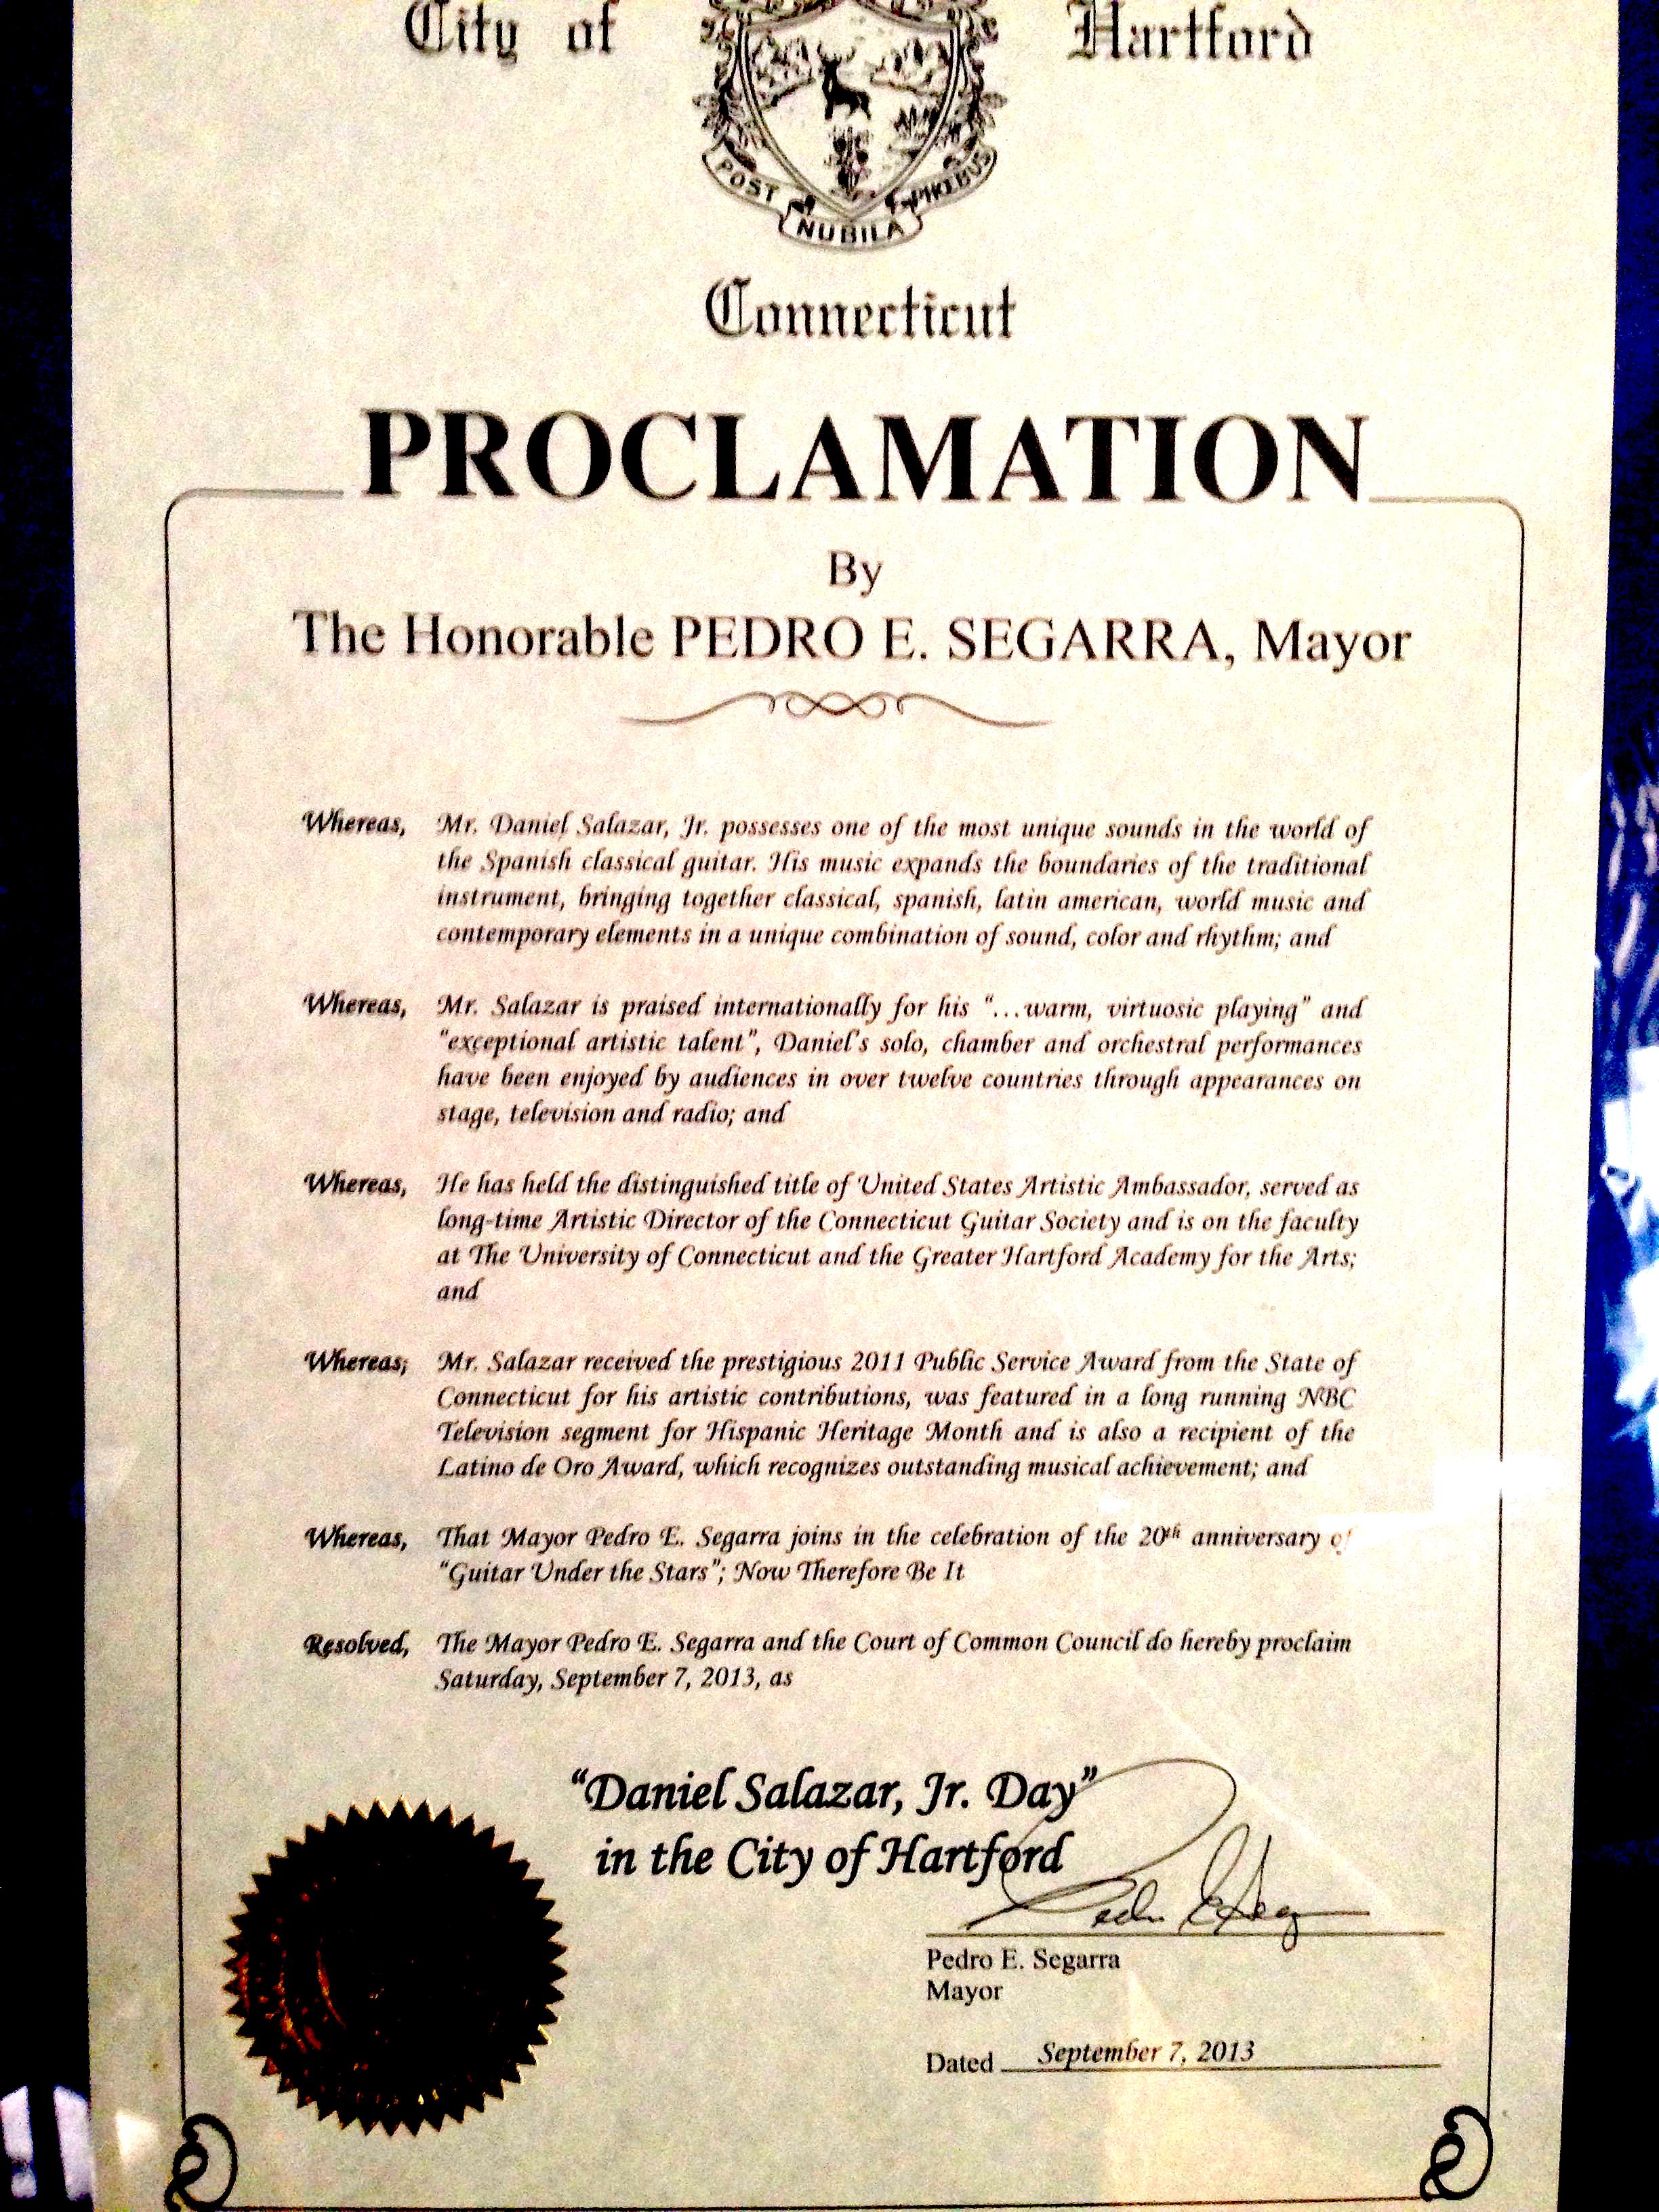 DS-Hartford_Proclamation.jpg